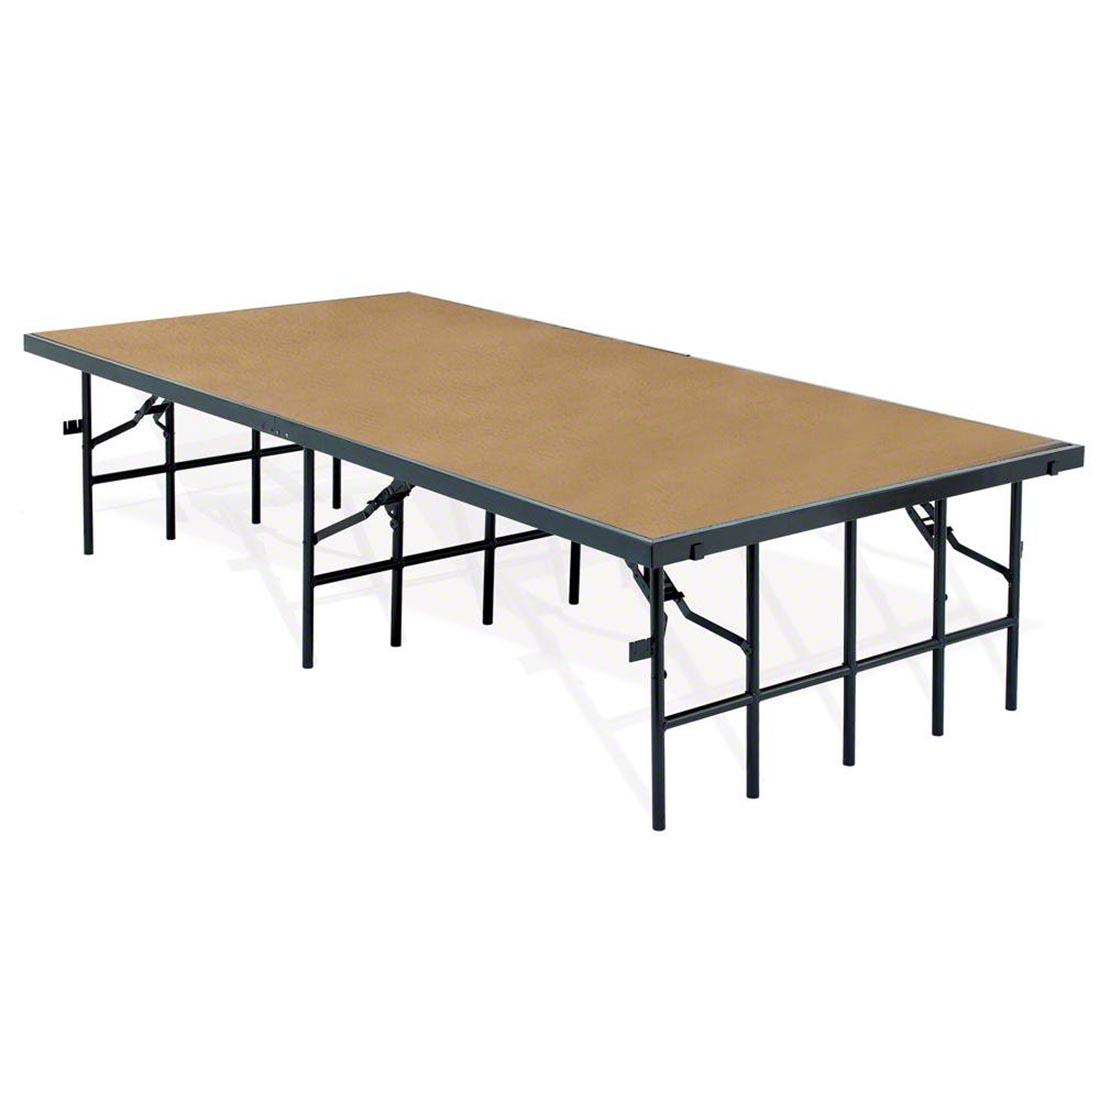 national public seating 48x96 hardboard stage panel - National Public Seating